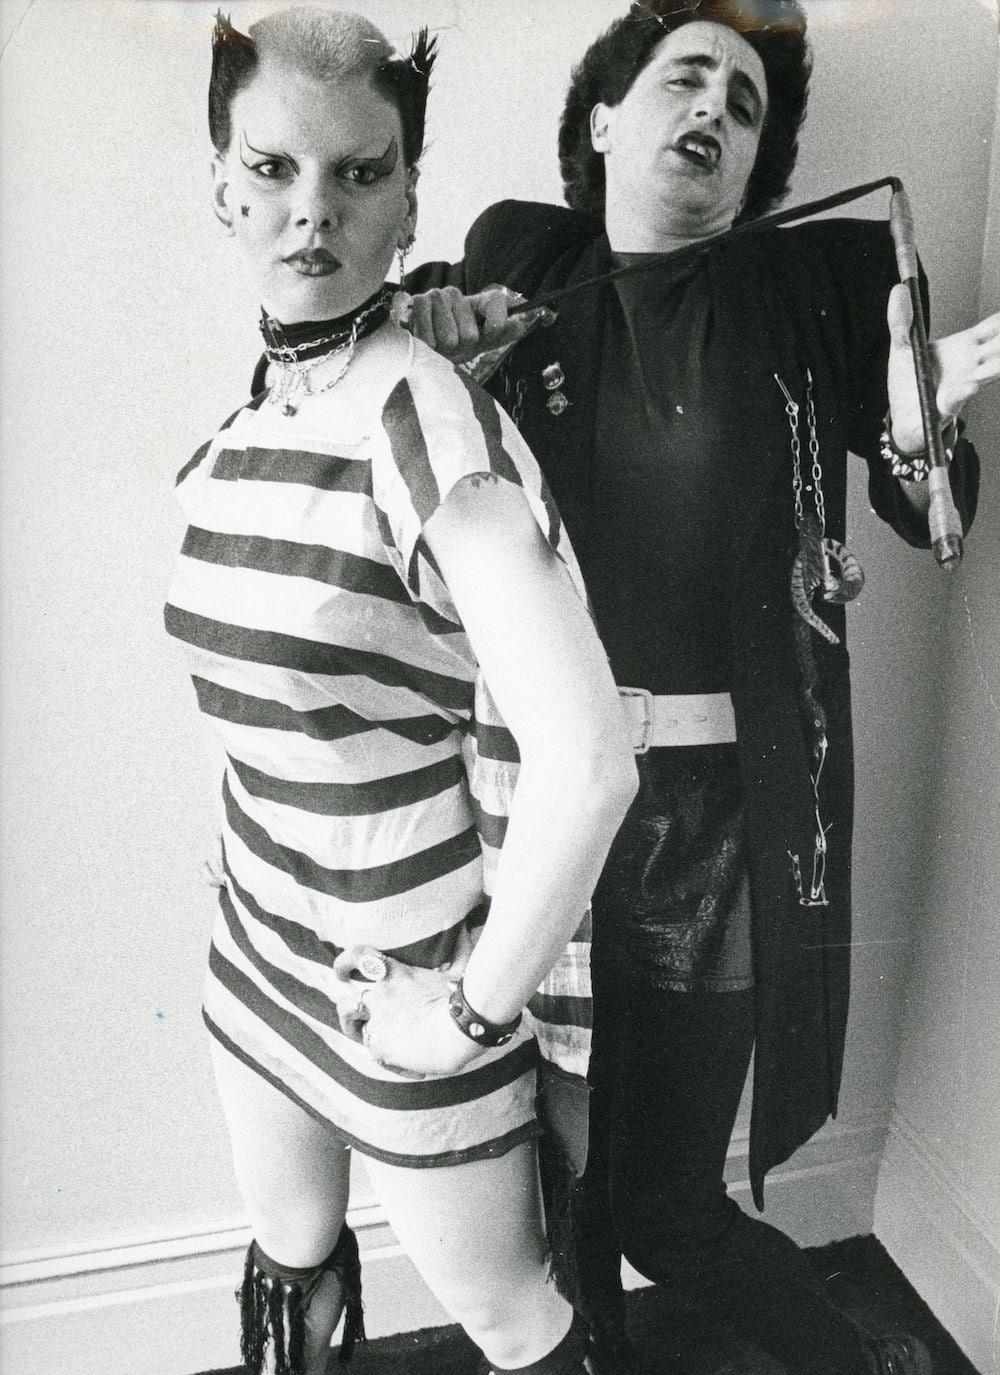 Soo Catwoman and Philip Salon